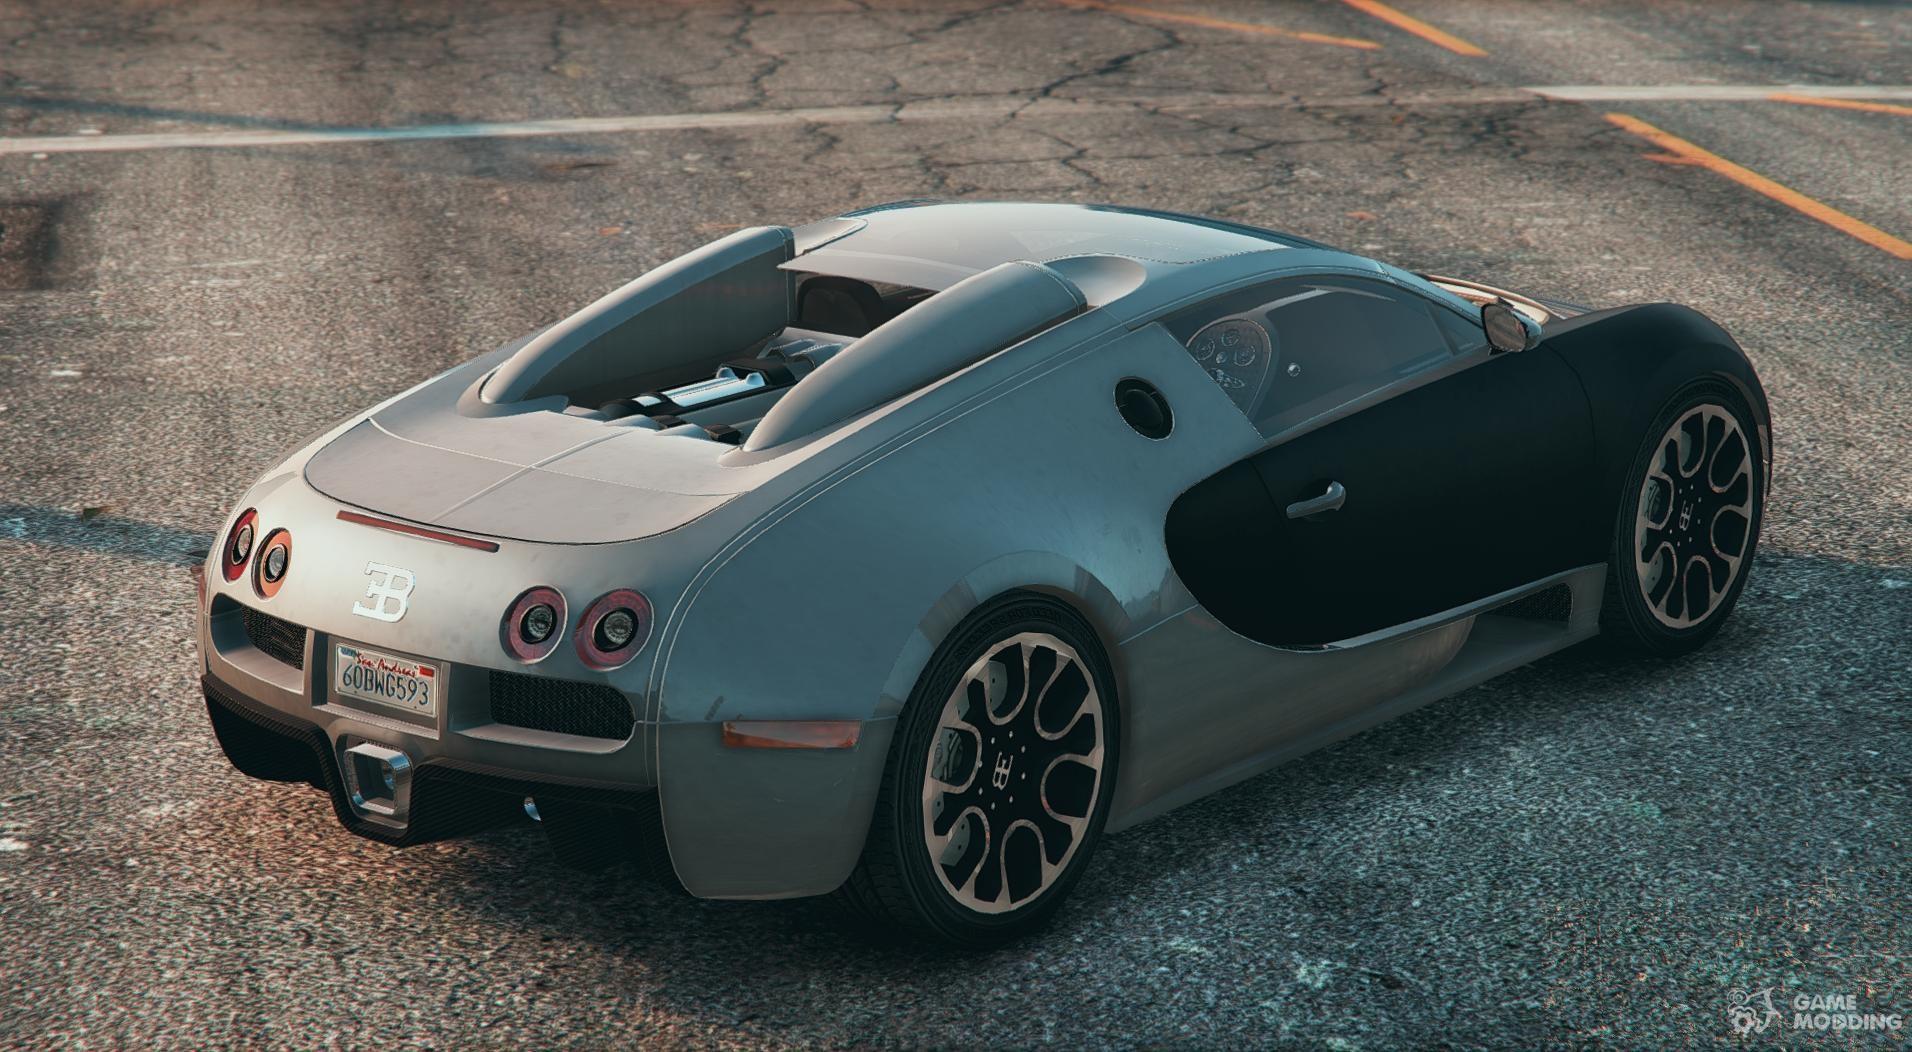 5febc4661d676b30c8b70b756334df73d361cd7fe5dcd04c916f9b49b6ba27d3 Wonderful Bugatti Veyron Xbox 360 Games Cars Trend